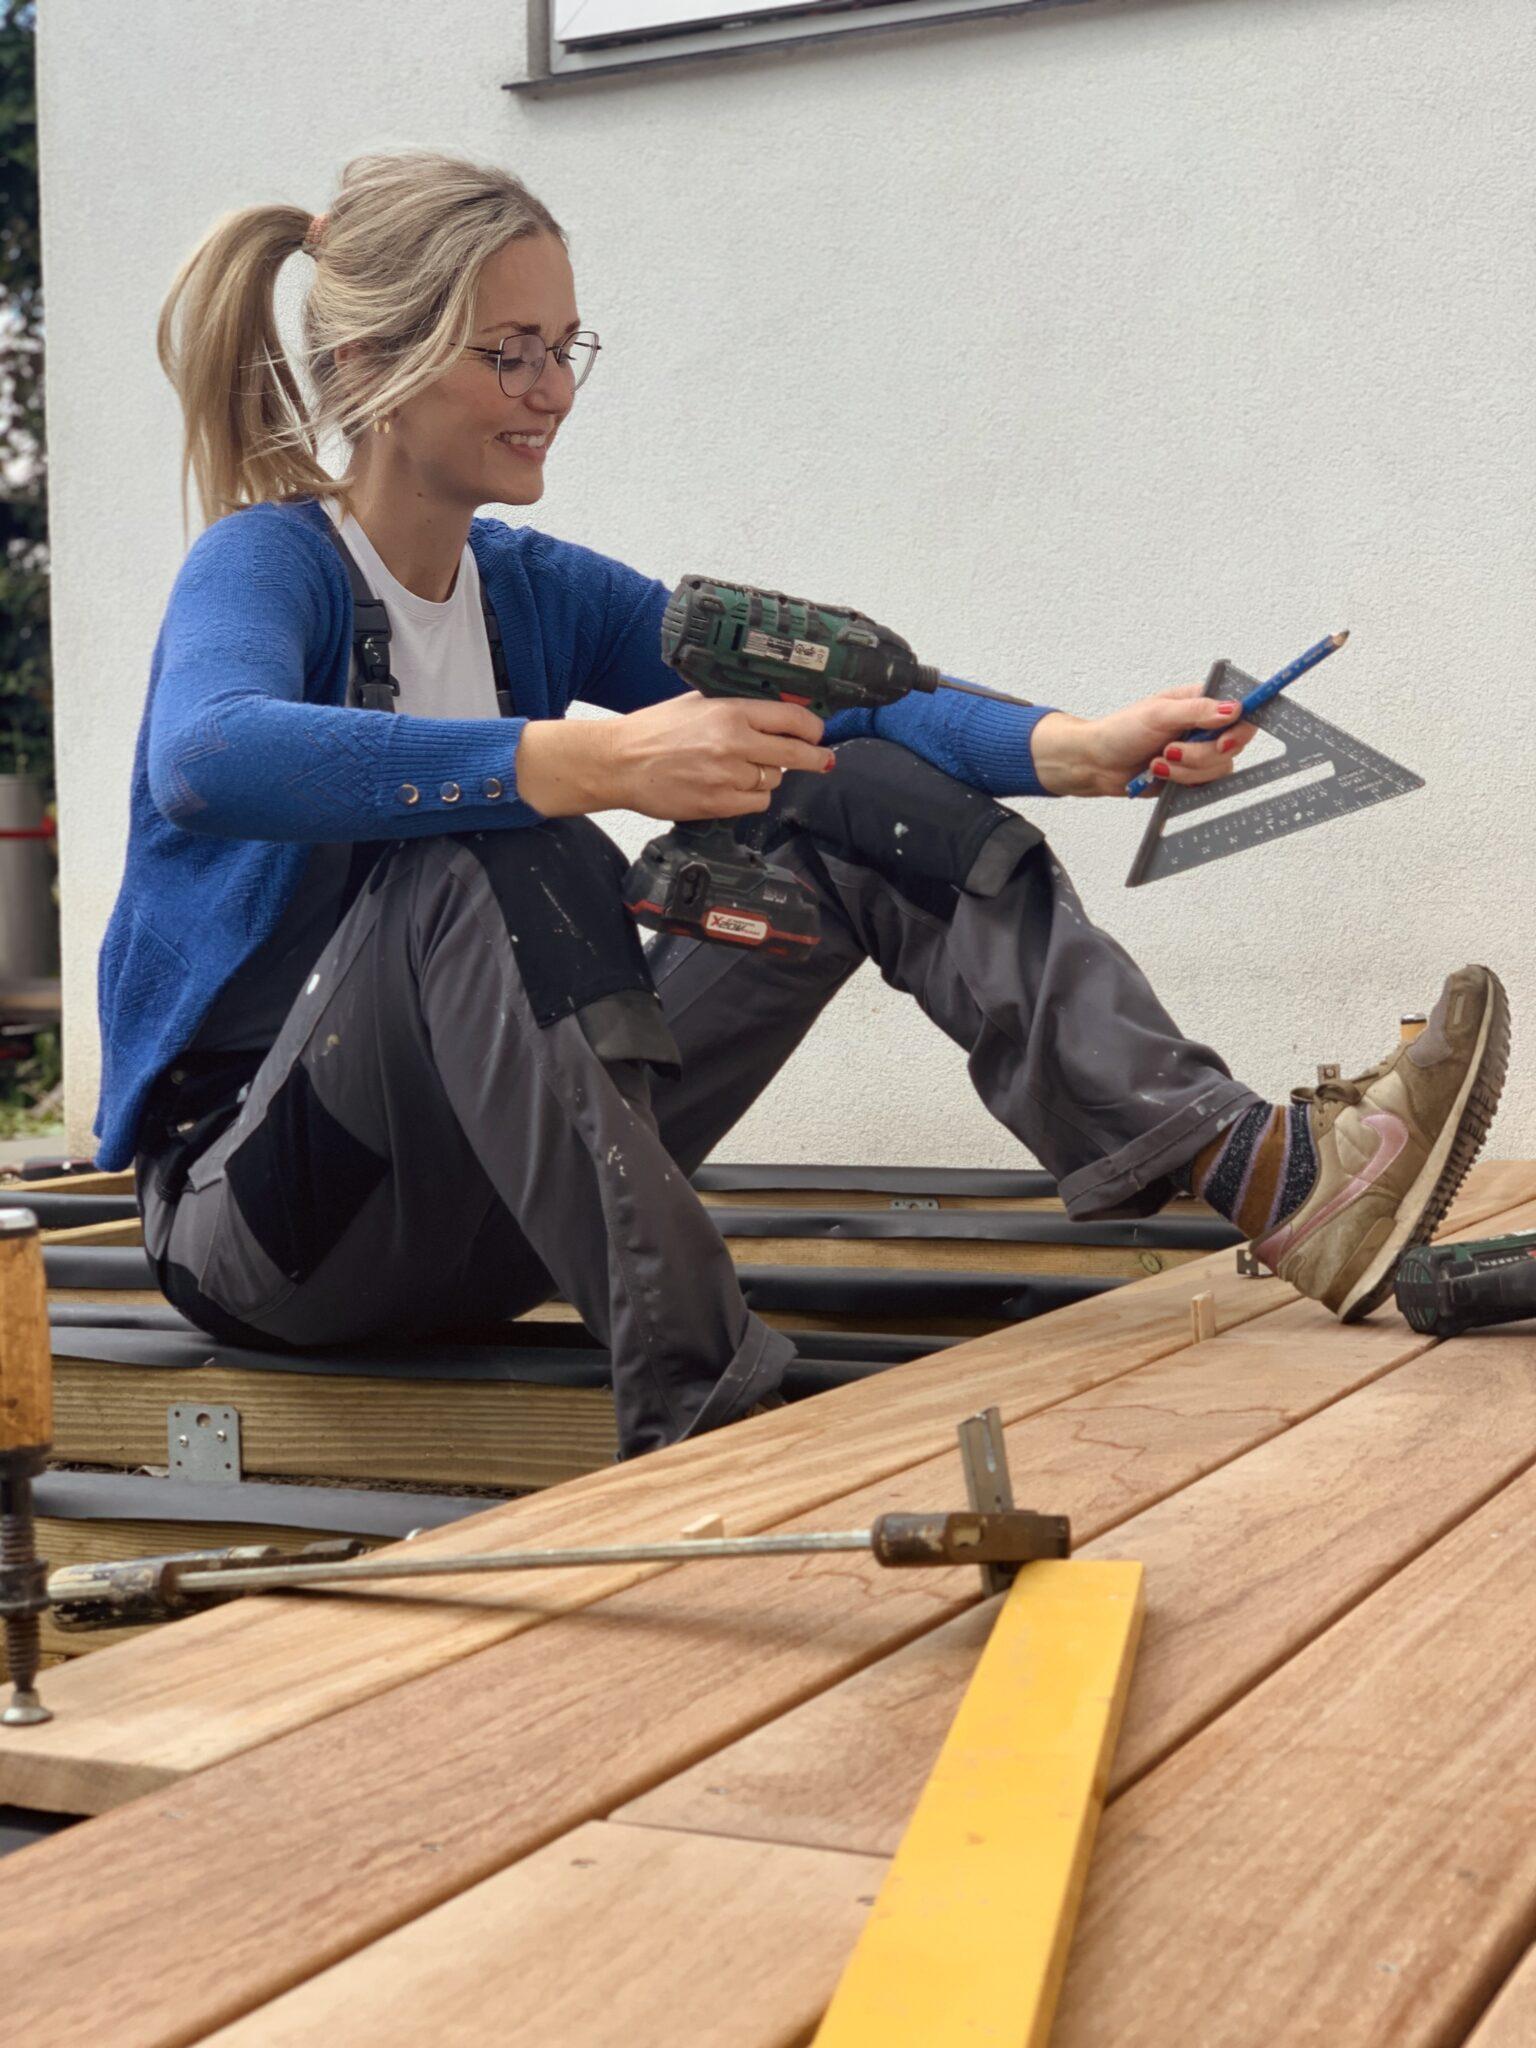 Byg en træterrasse - guide